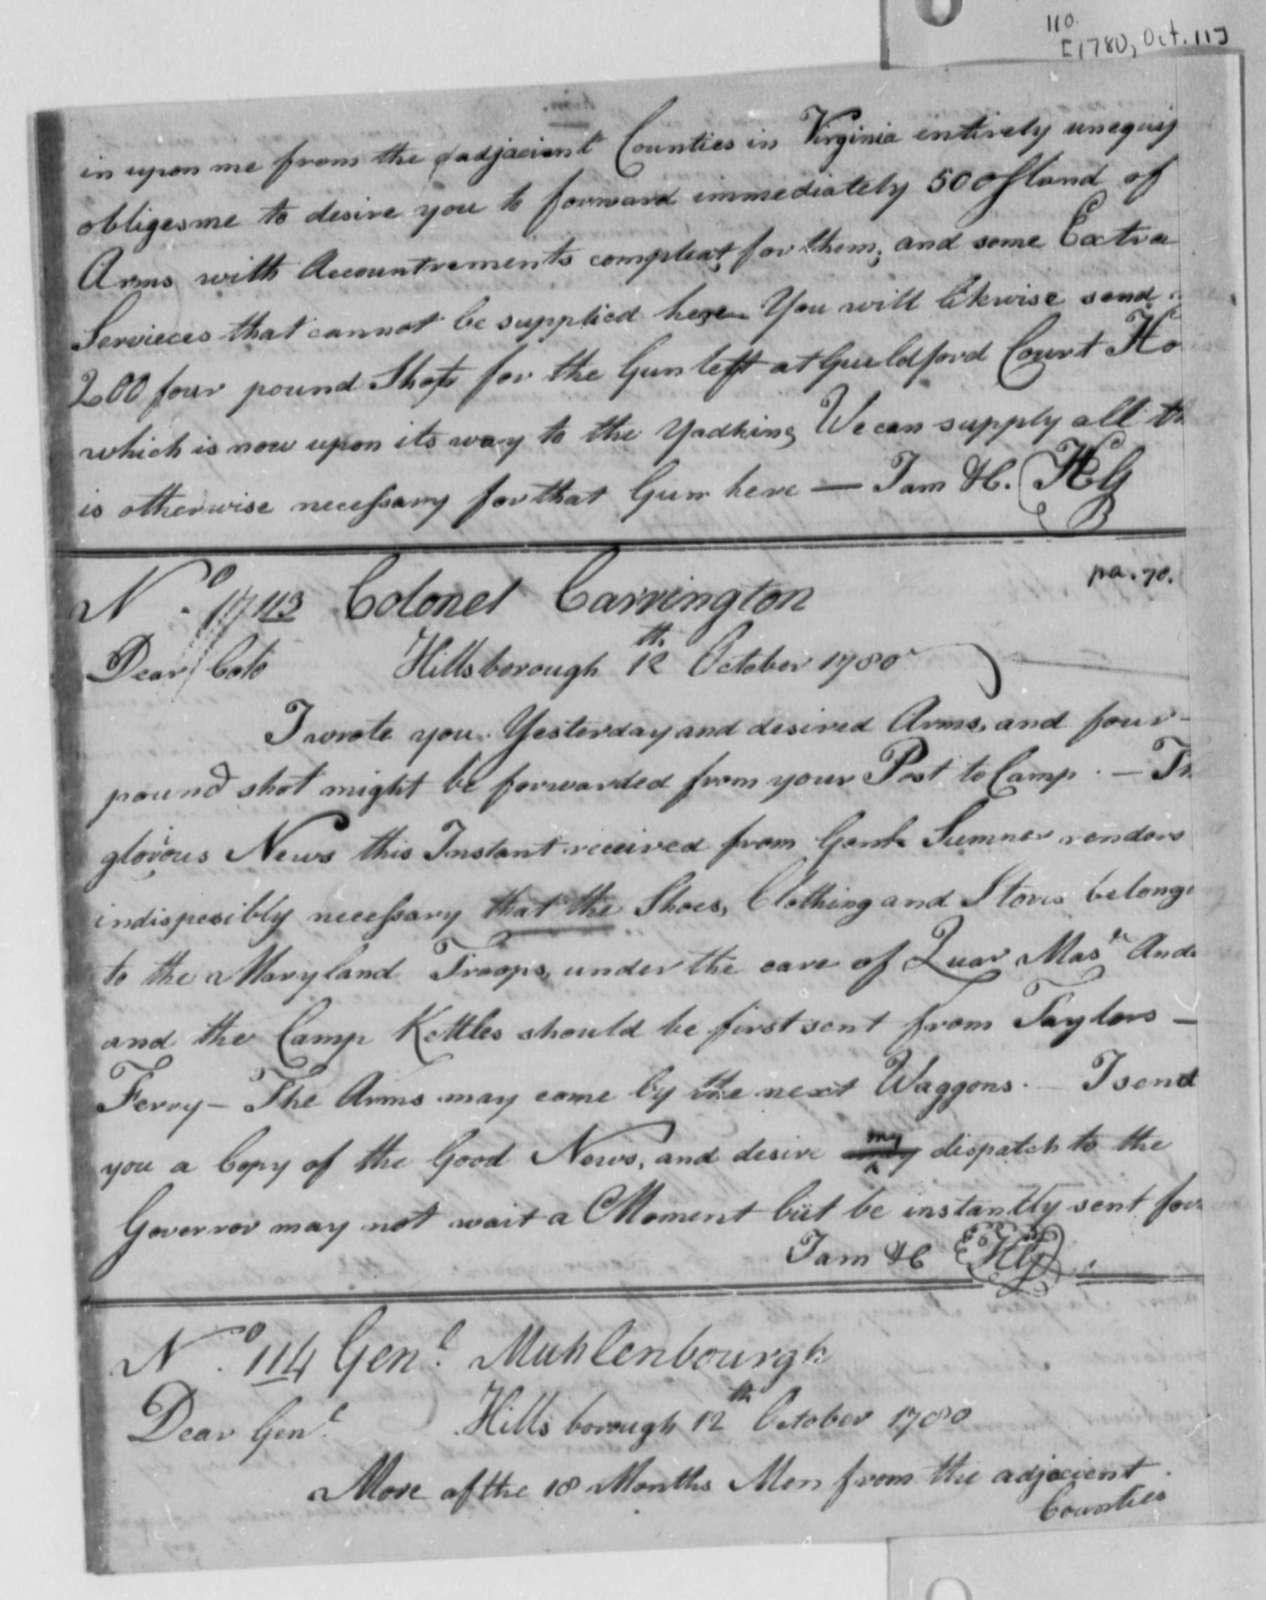 Horatio Gates to Edward Carrington, October 12, 1780